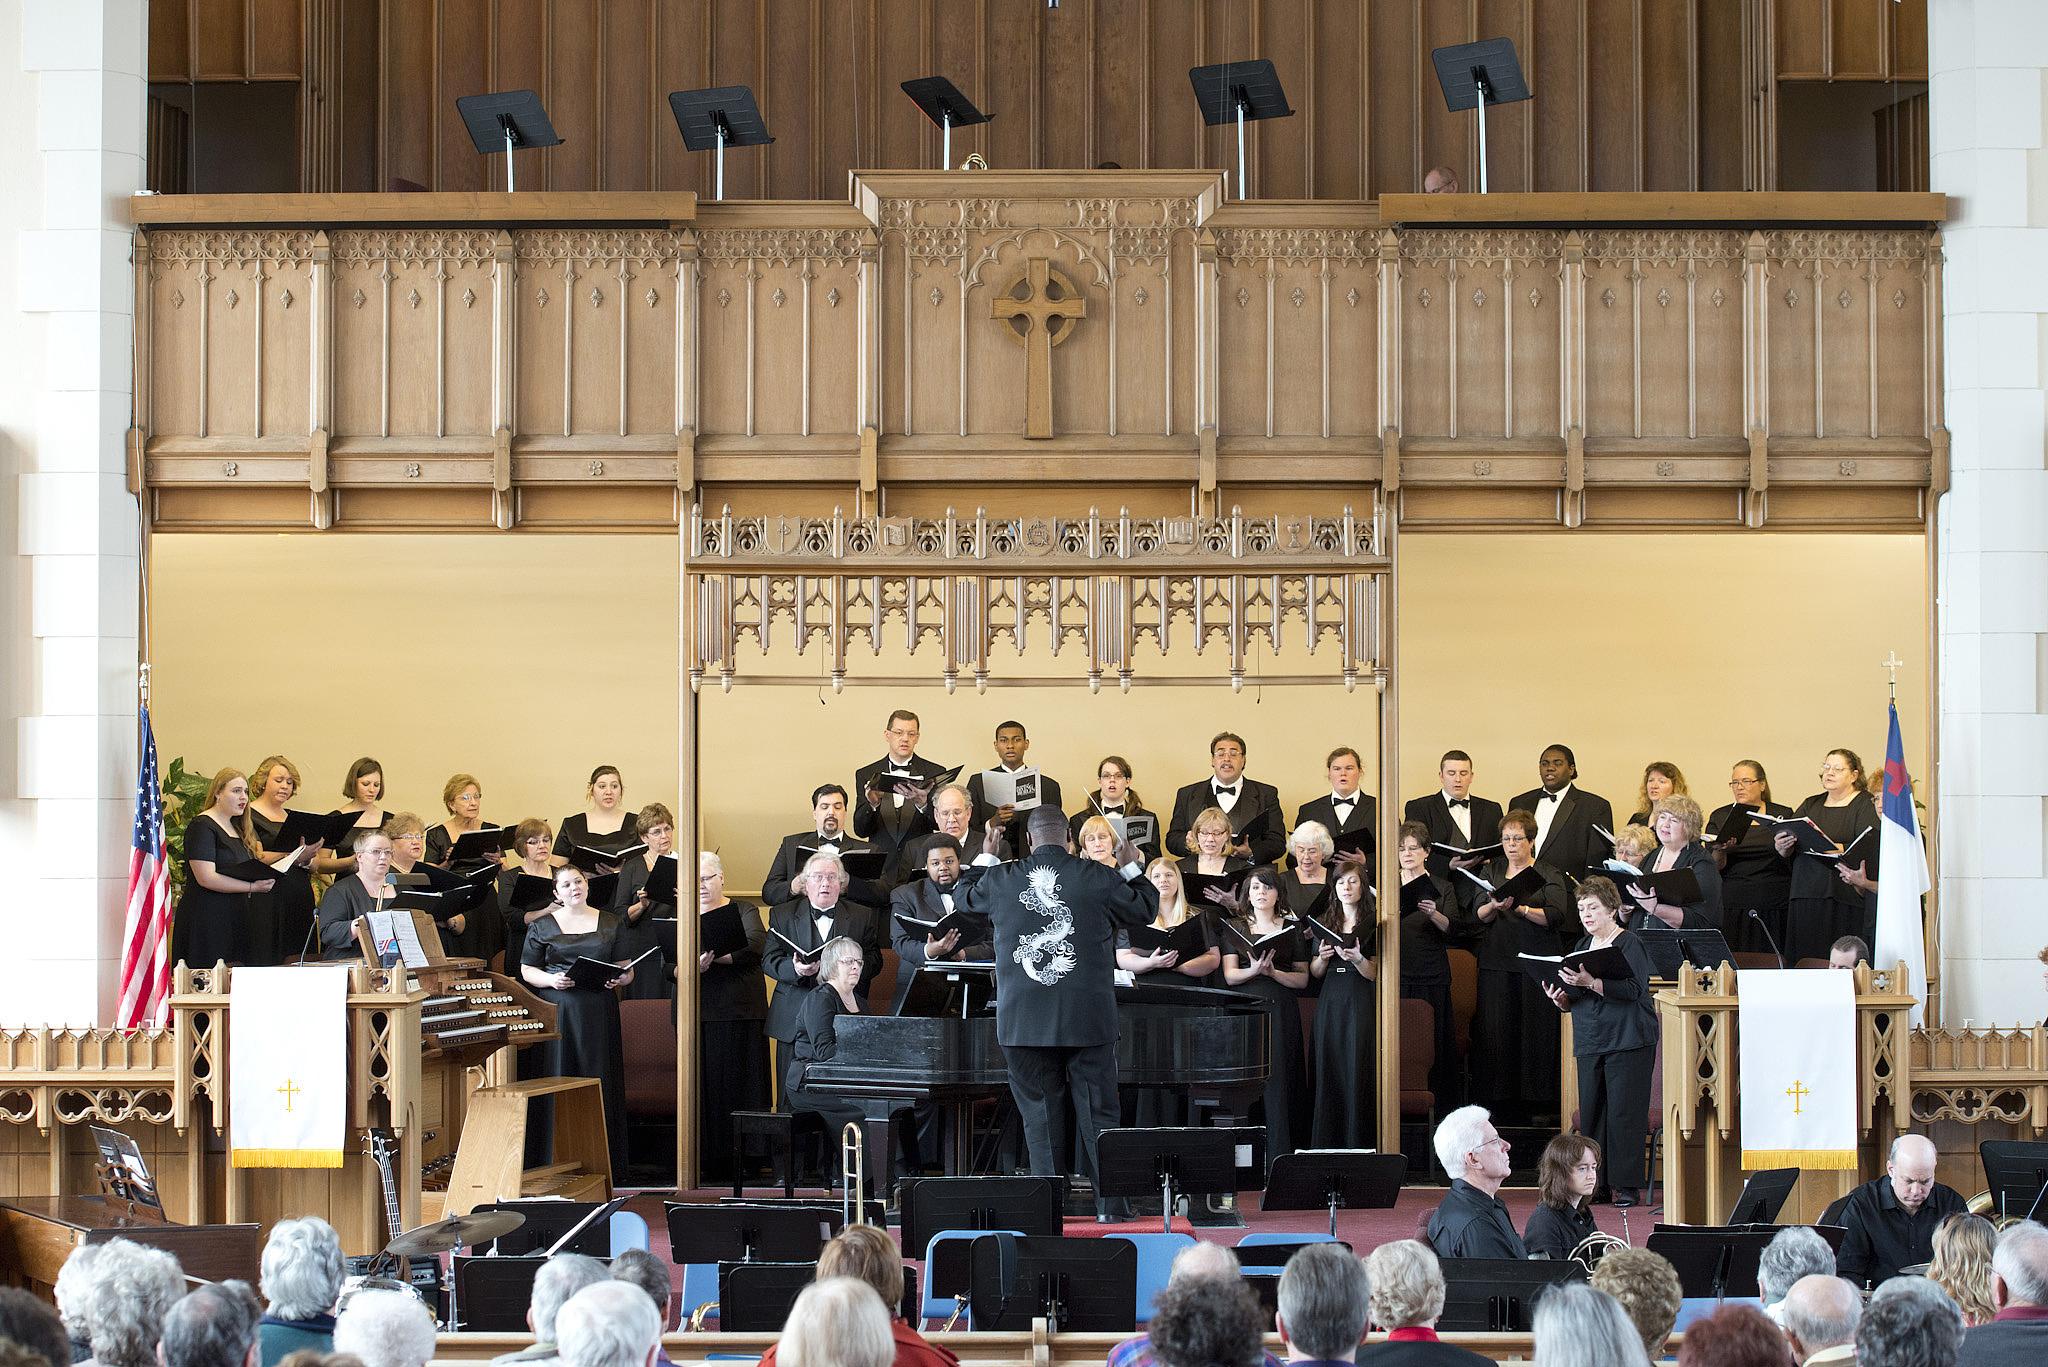 KCC choirs perform at First Presbyterian Church in downtown Battle Creek.